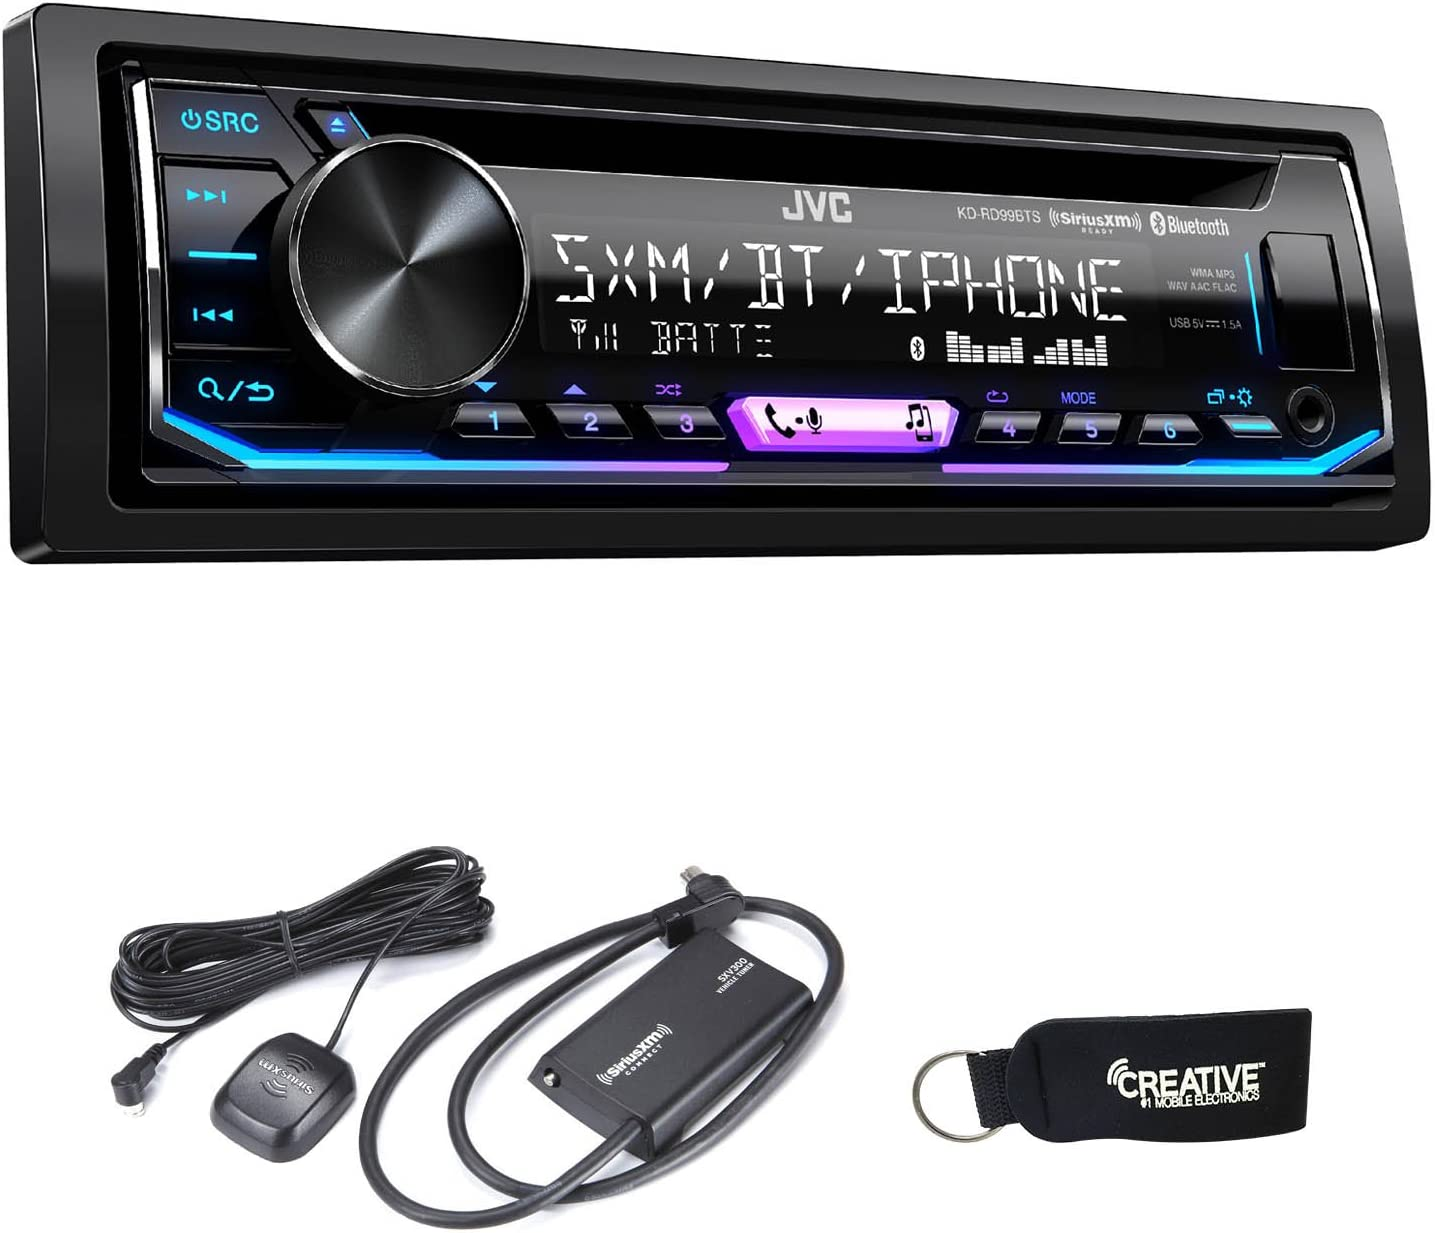 USB//AUX JVC KD-RD99BTS CD Receiver w// Bluetooth SiriusXM Ready and Remote App